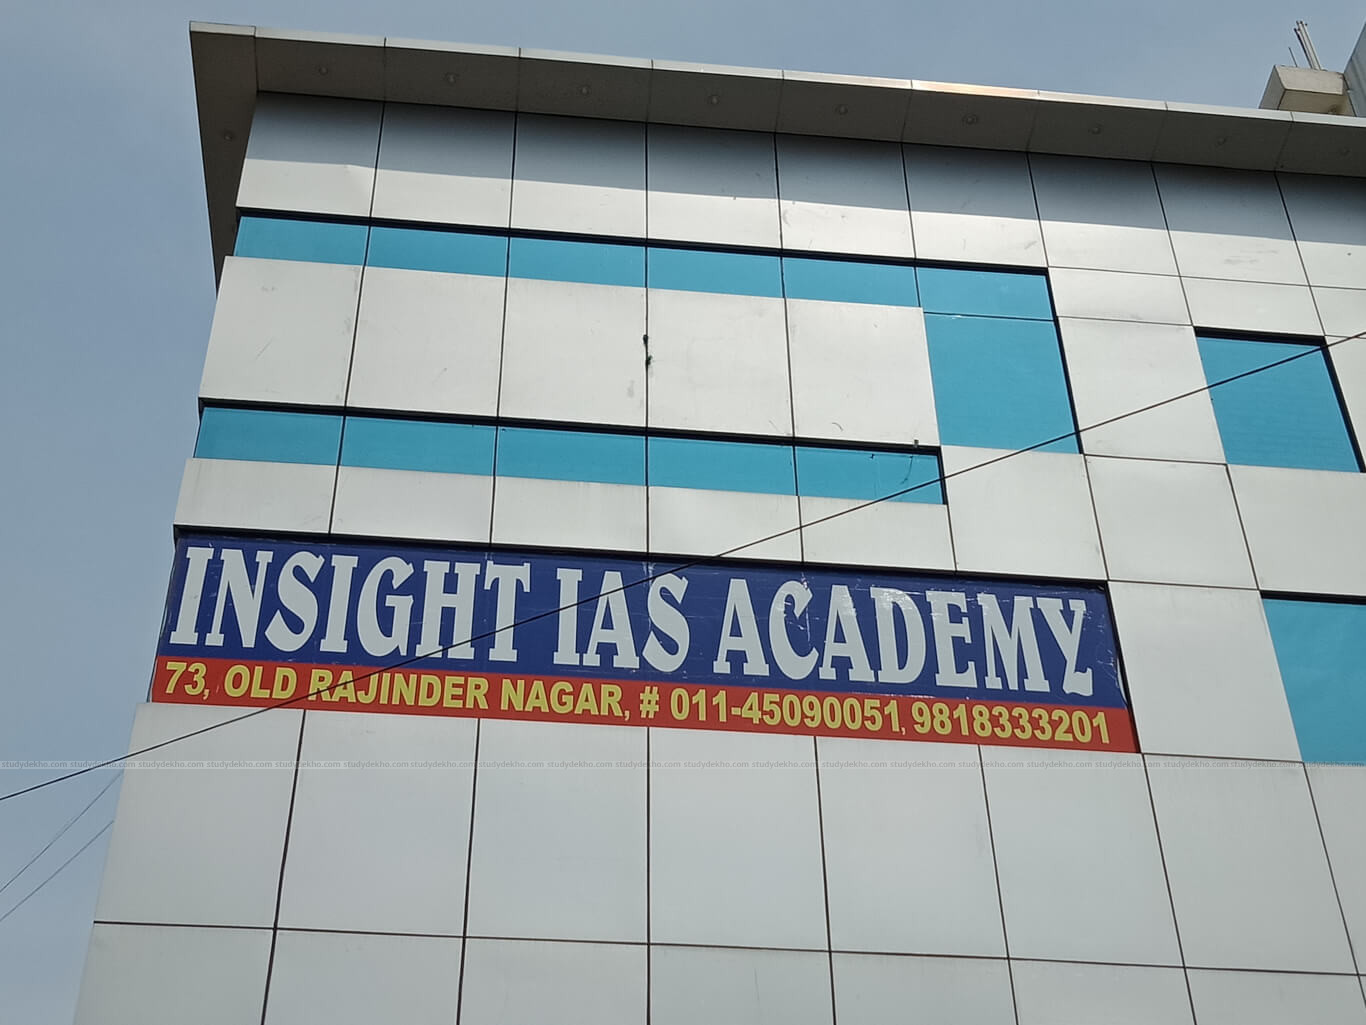 Insight IAS Academy Gallery